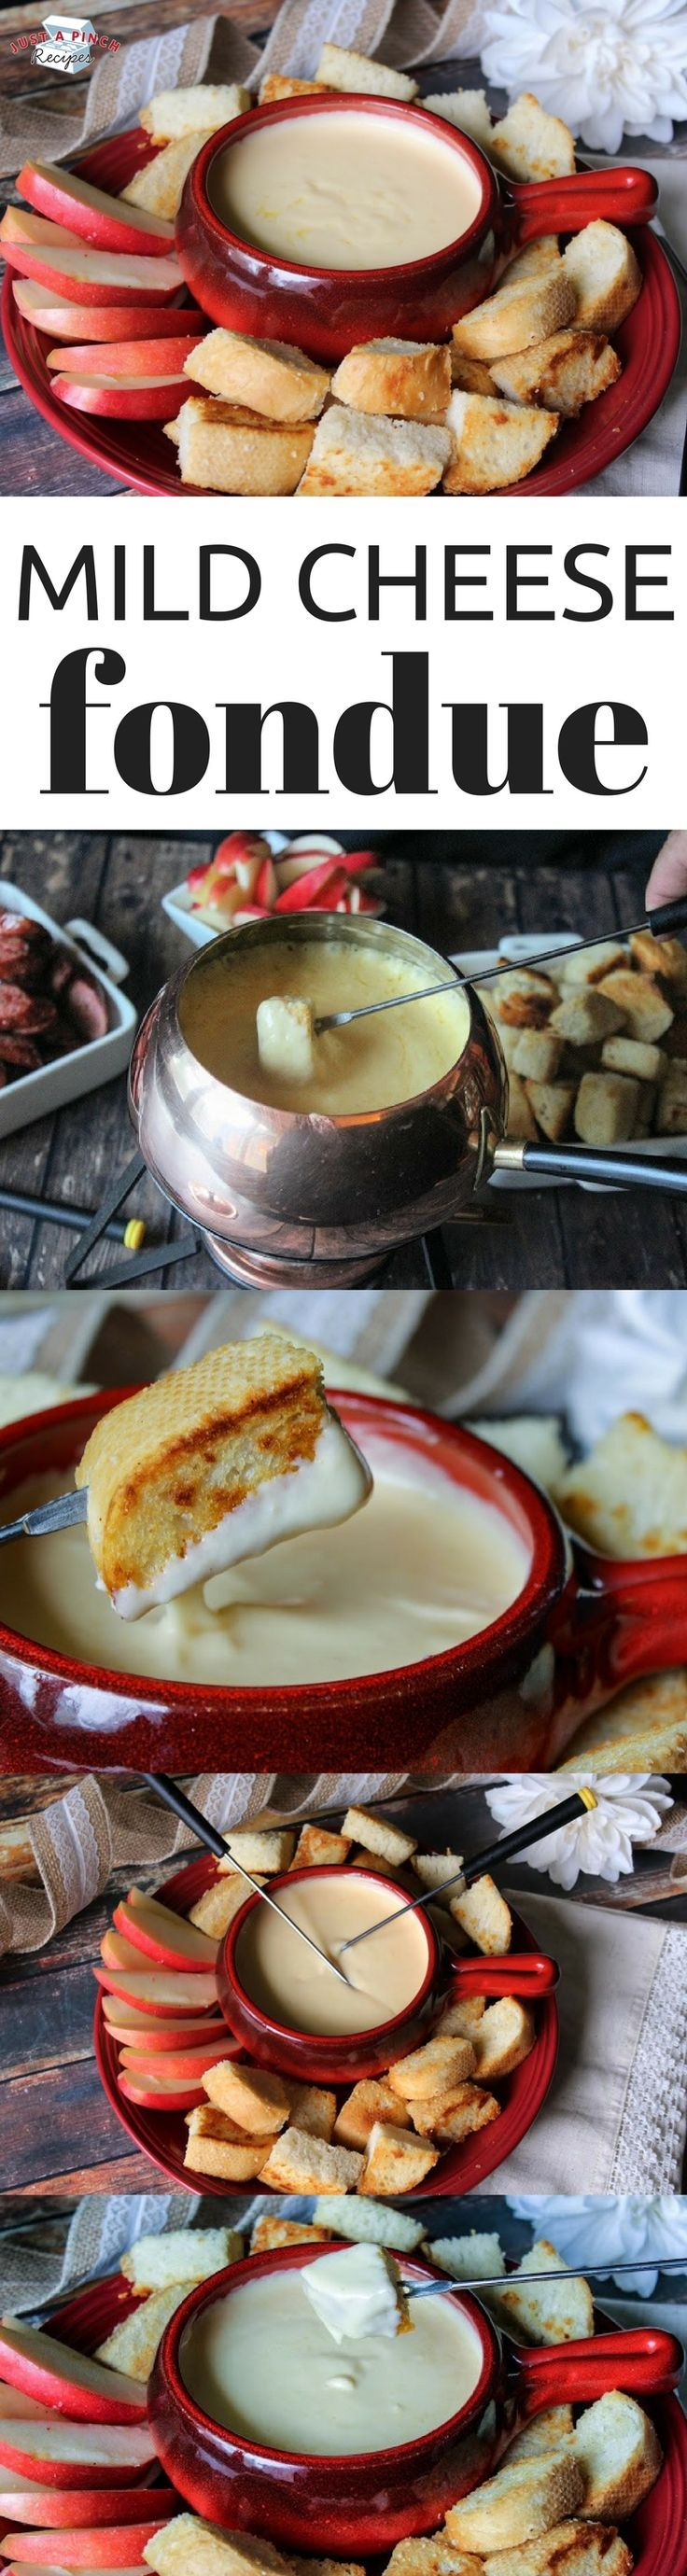 Easy homemade cheese fondue recipe!